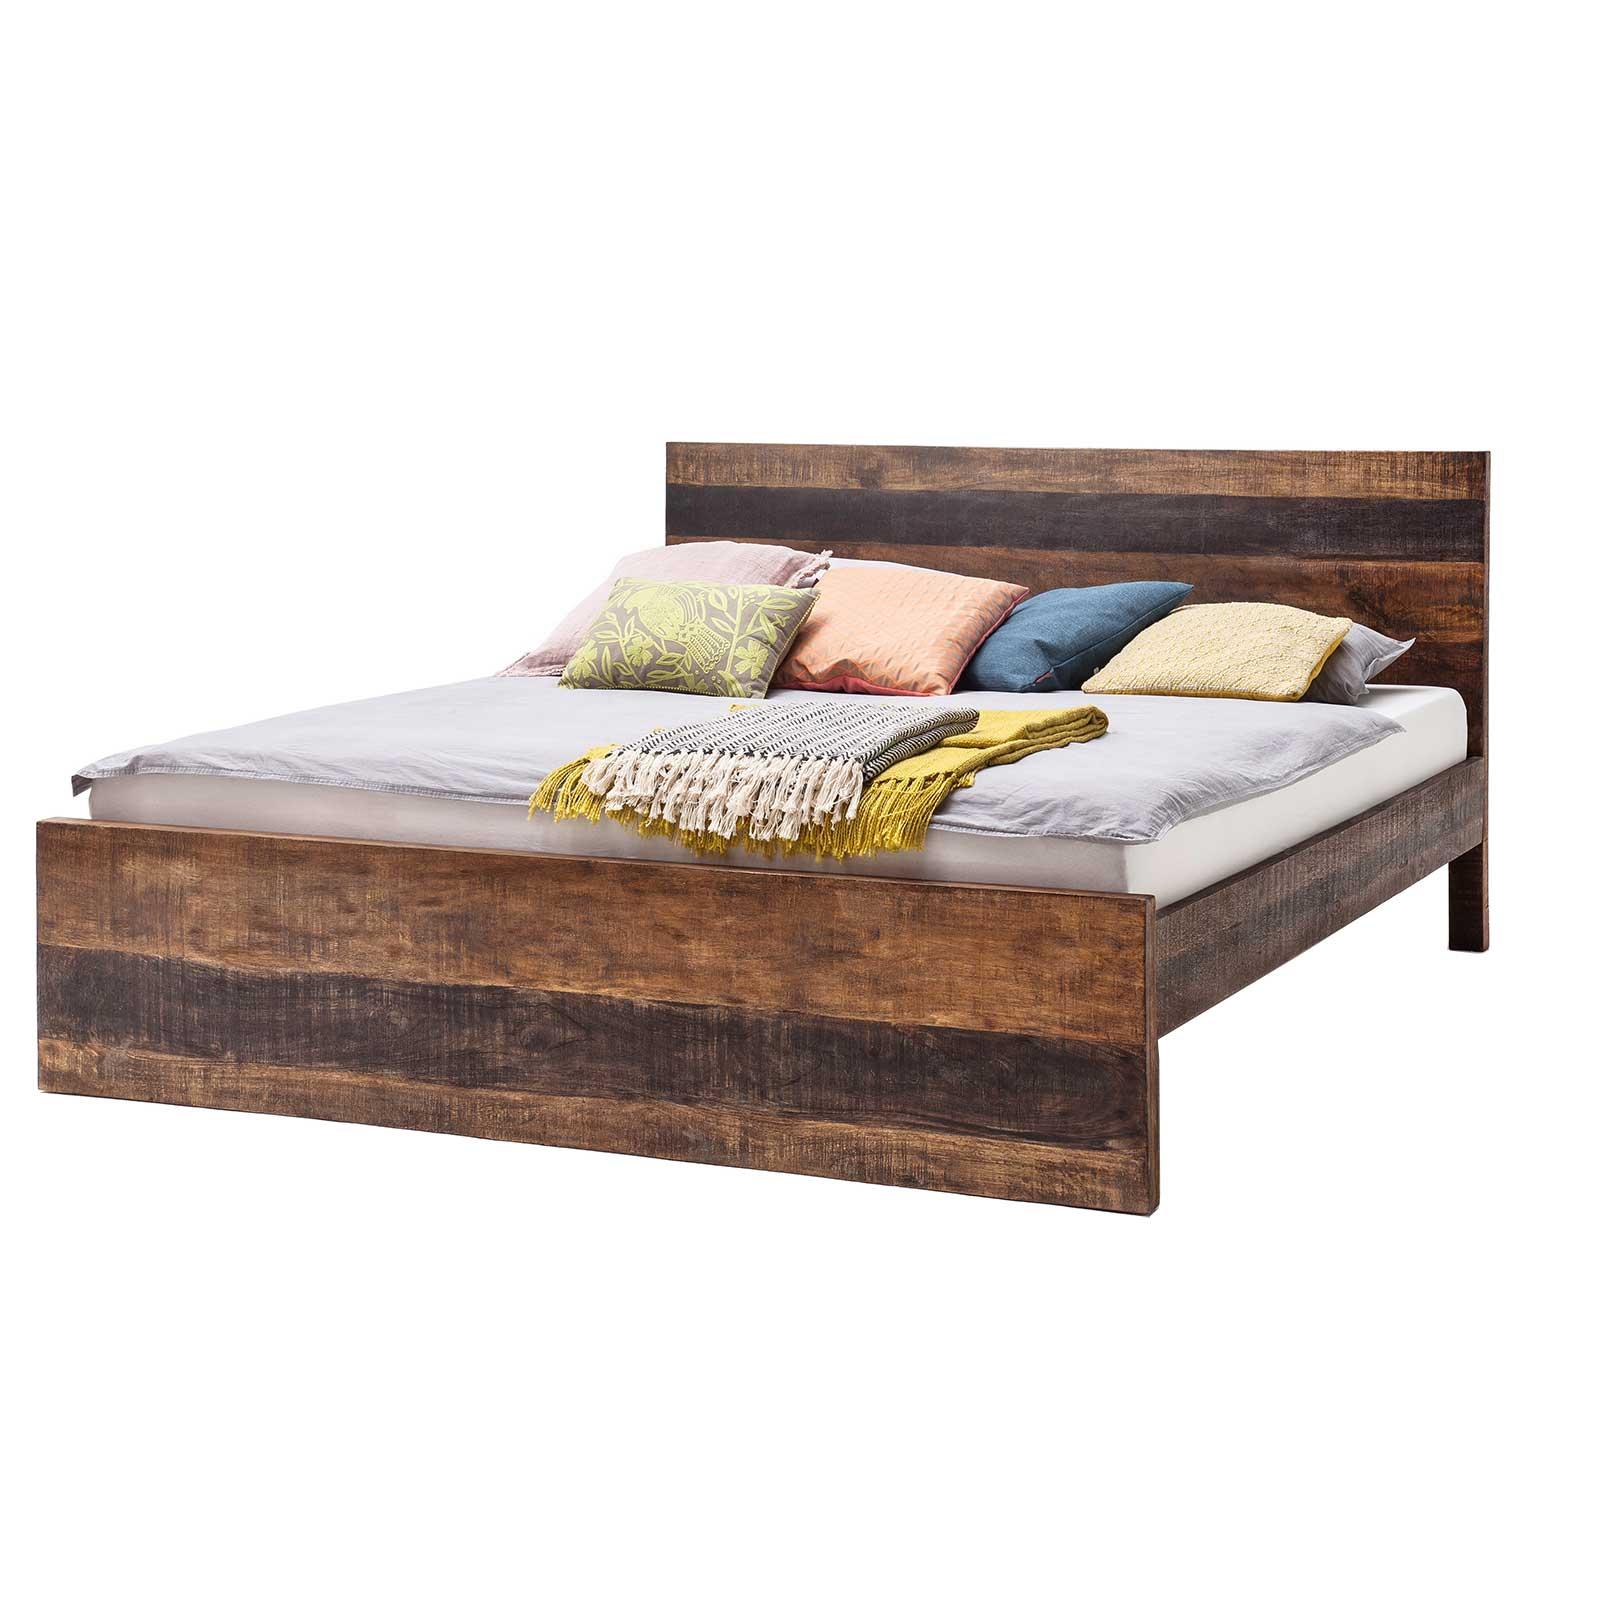 Full Size of Bett Antik Kumasi Aus Massivholz In Braun 158 213 Cm Mbel Ideal Weißes 90x200 Betten Hamburg Tojo V Holz 200x200 Amerikanisches Clinique Even Better Breit Bett Bett Antik